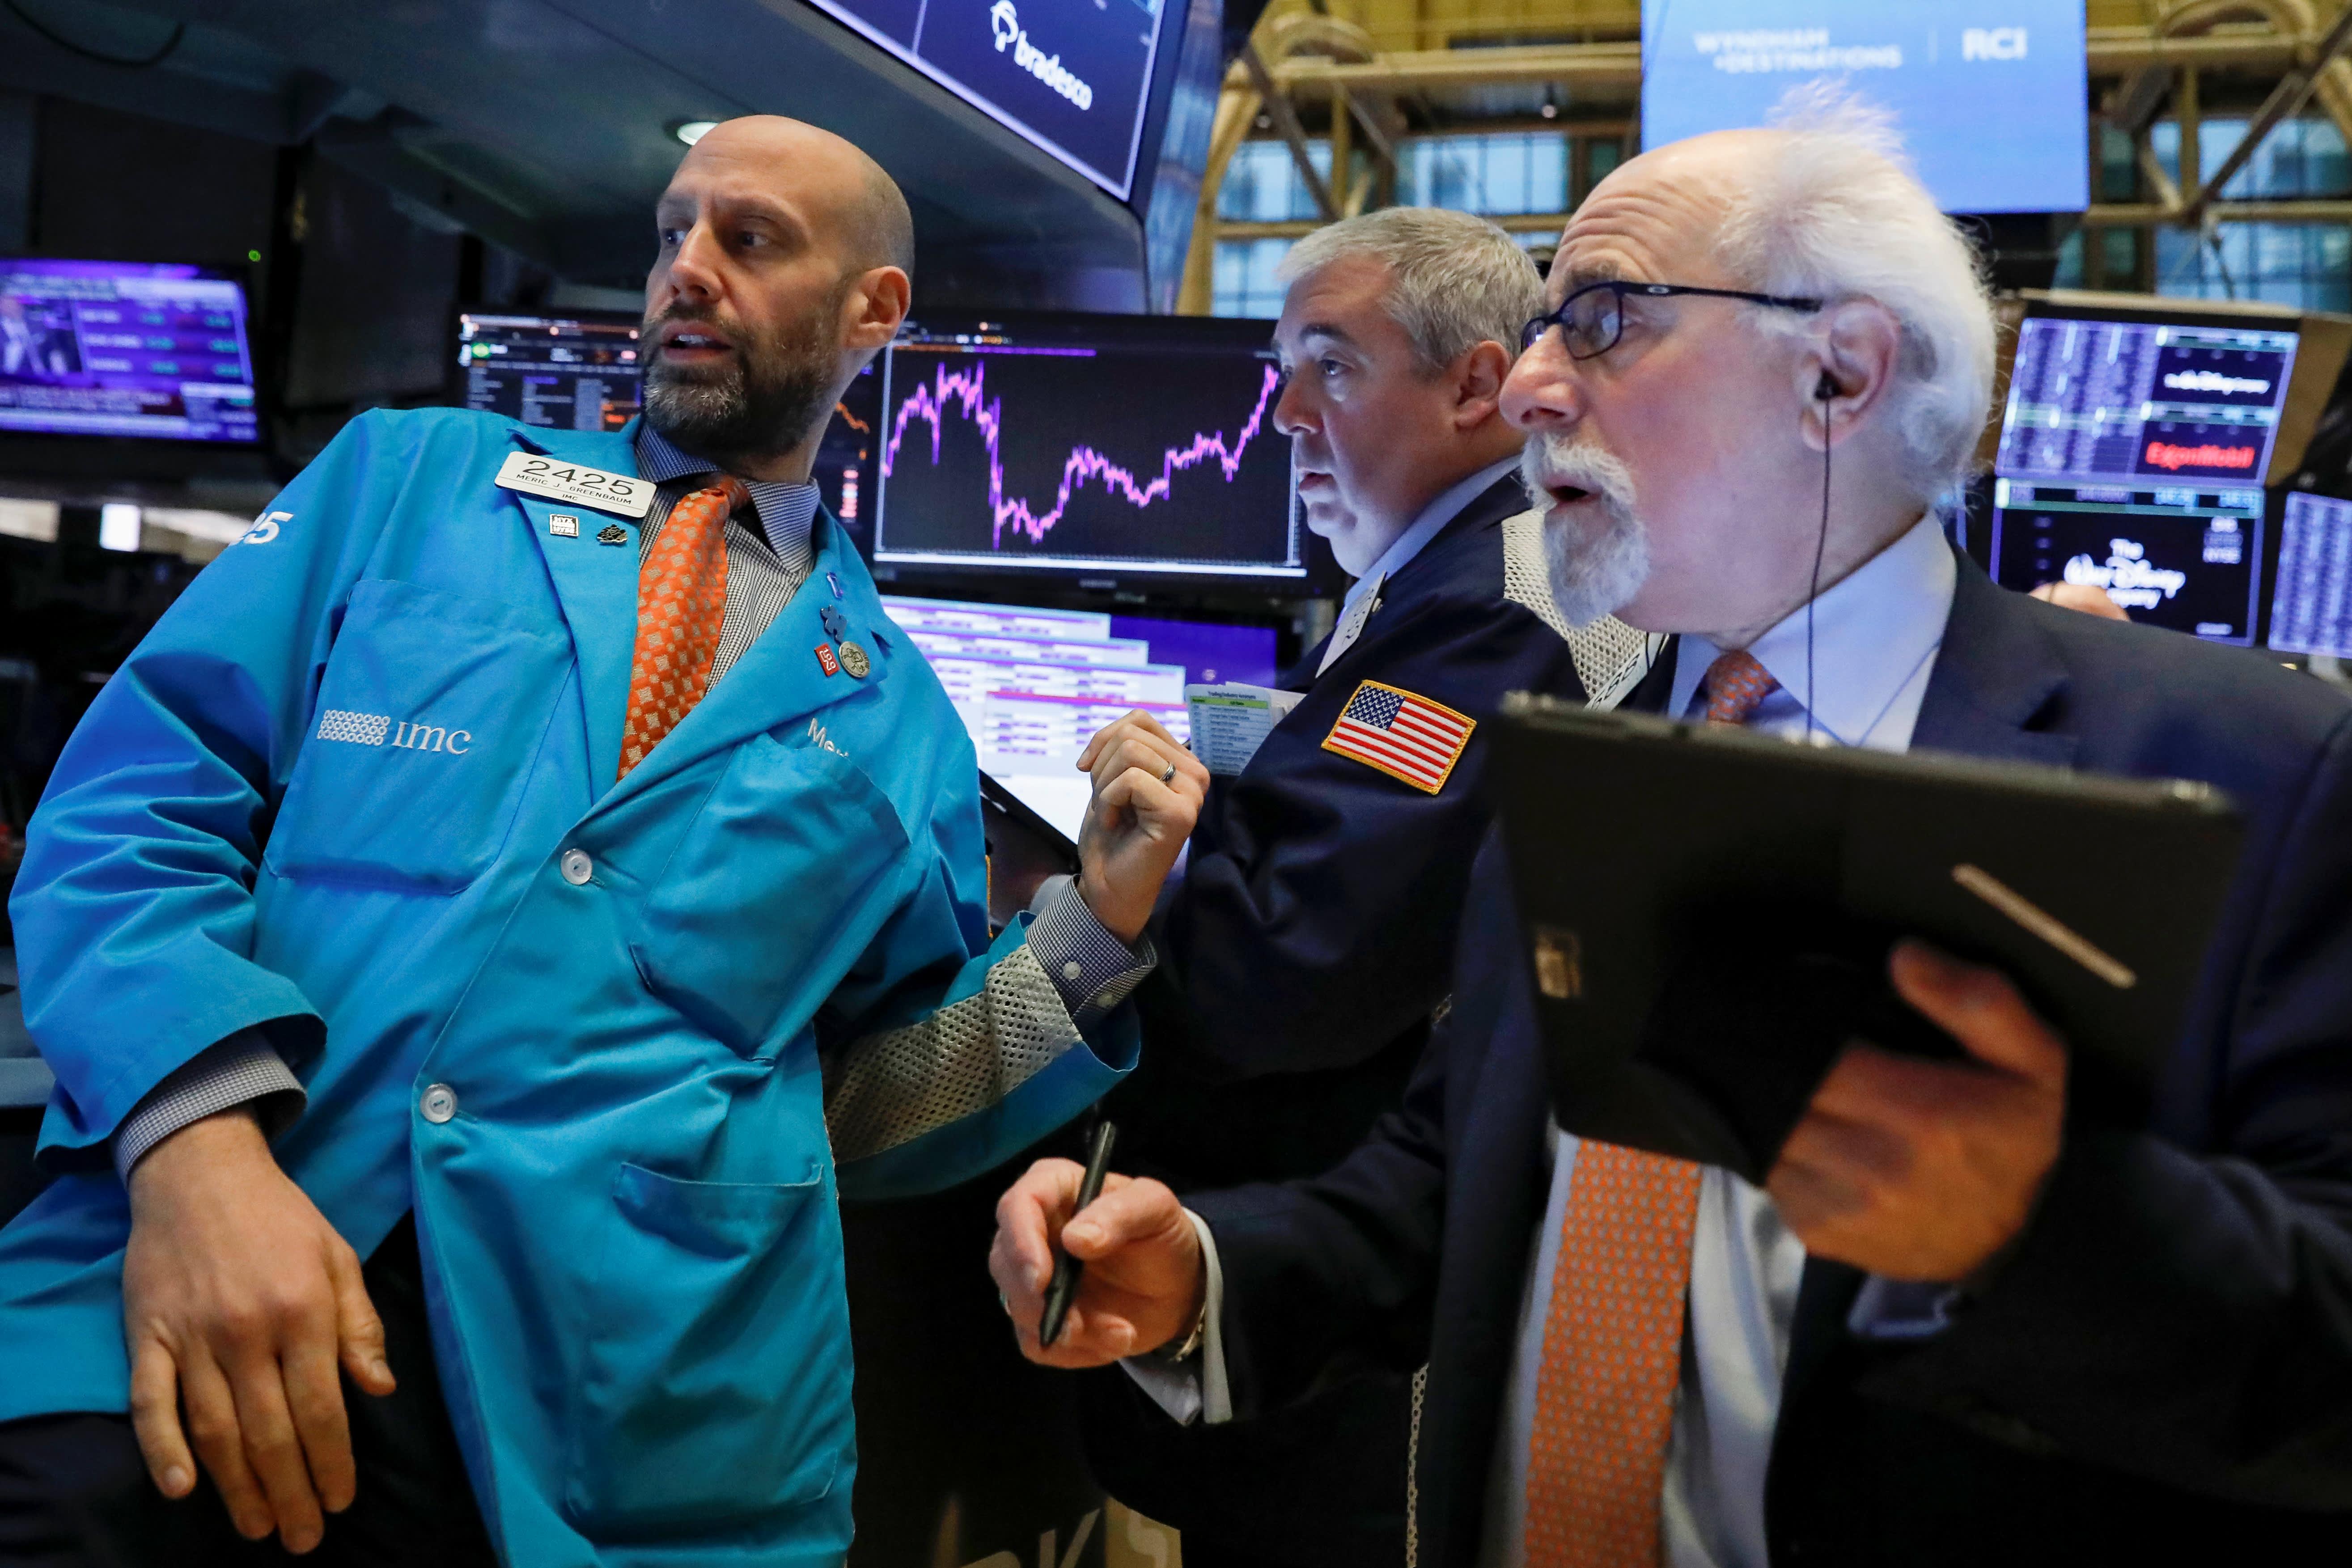 Stocks making the biggest moves premarket: Bank of America, UnitedHealth, Goldman, Target & more